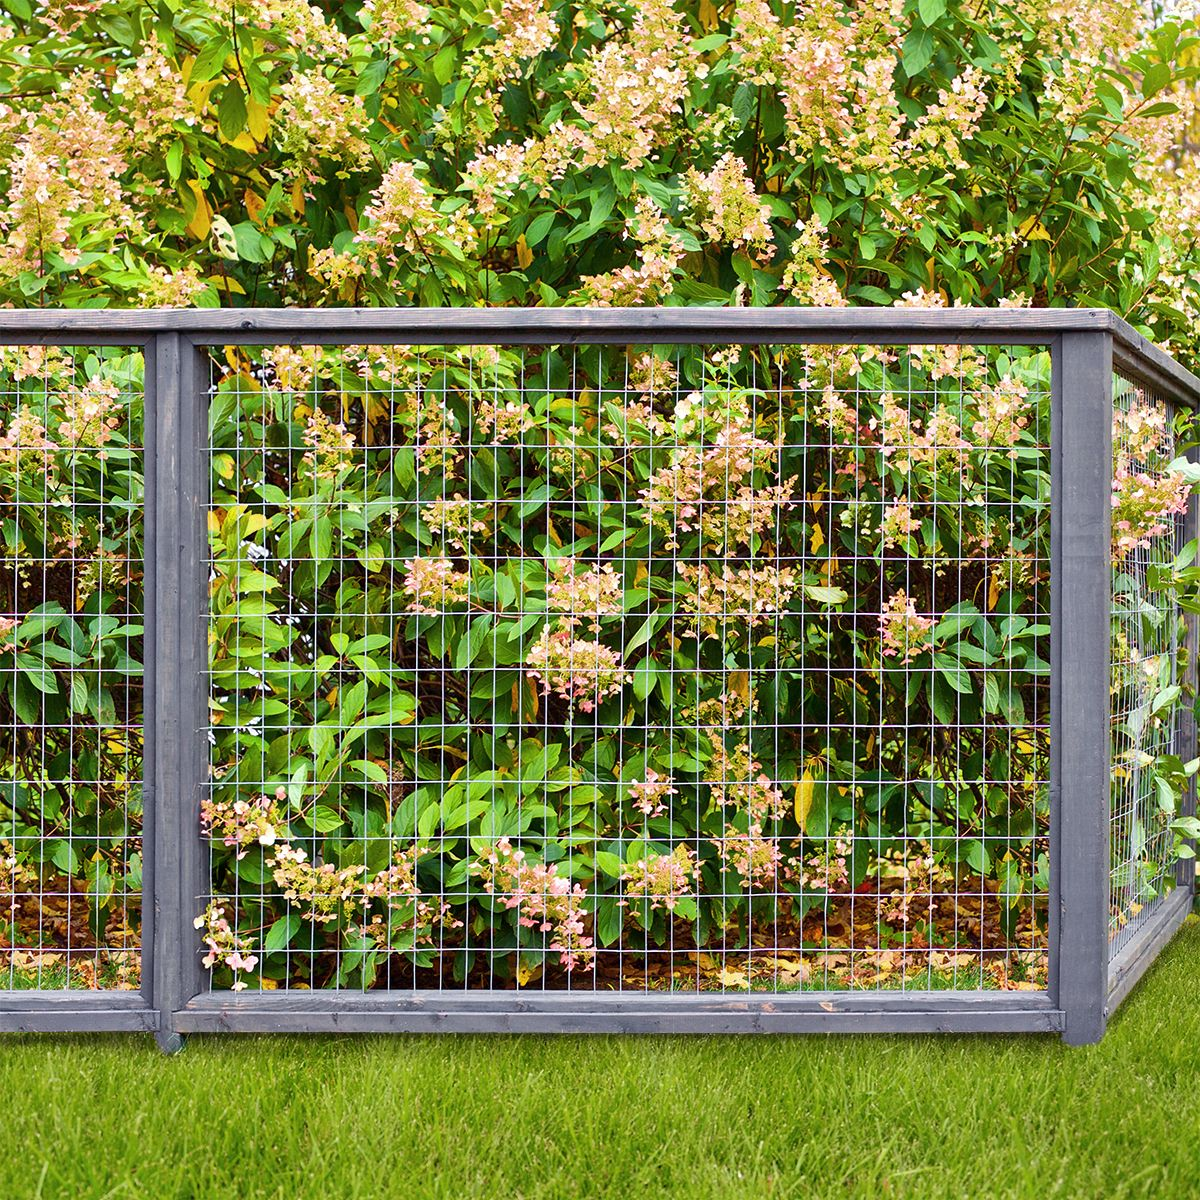 "Expert Gardener Galvanized Steel Gray Welded Wire Fence, 36"" x 50' Roll - Walmart.com"